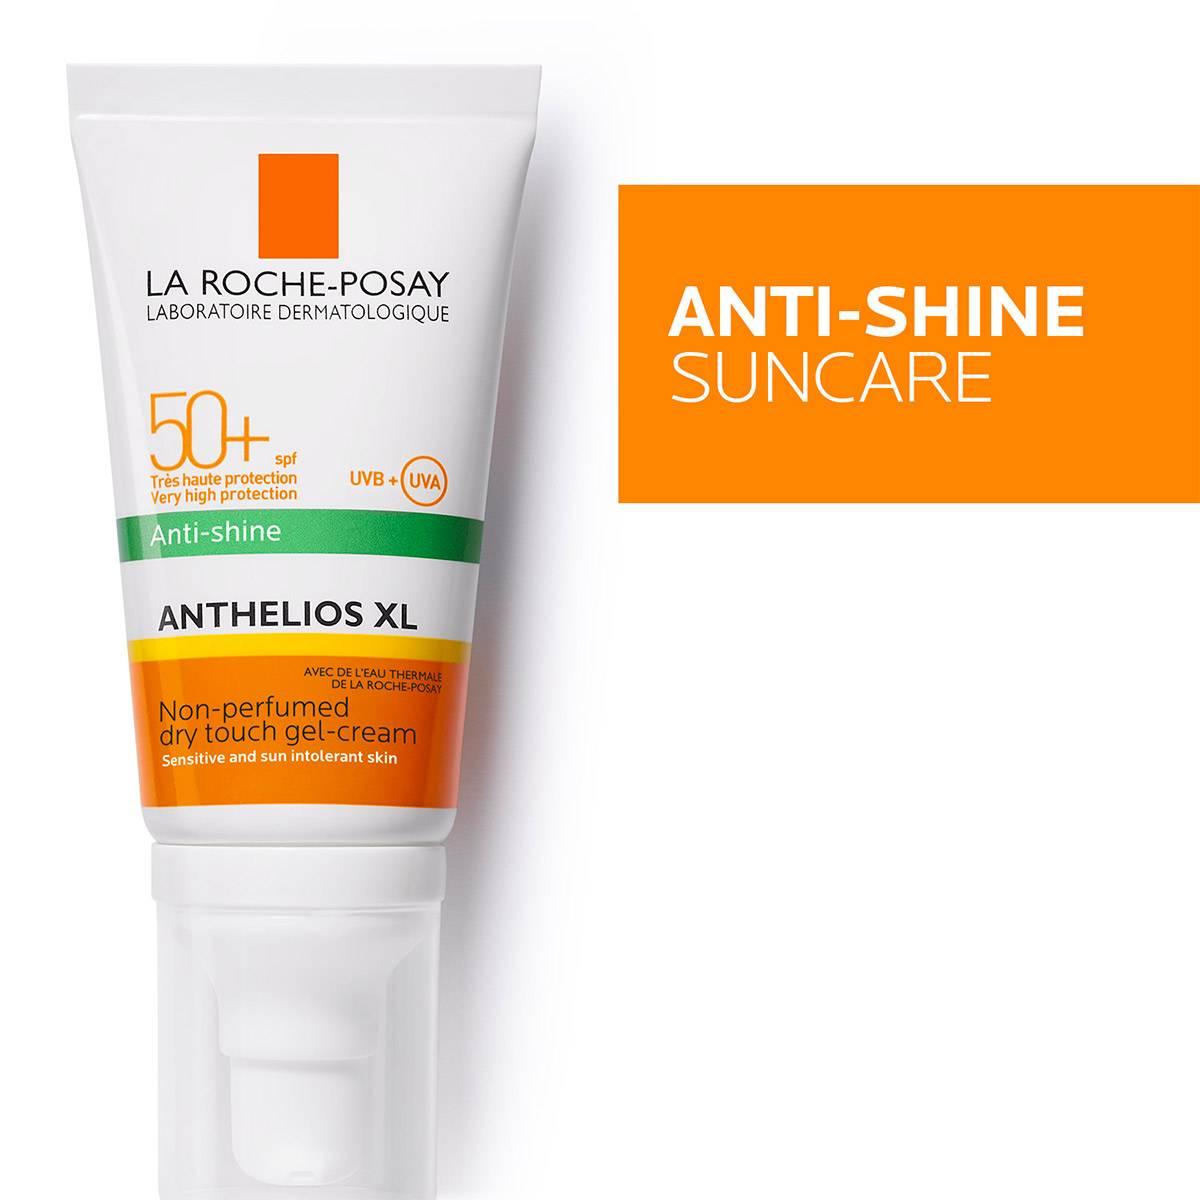 La Roche Posay Tuotesivu Aurinko Anthelios XL Dry Touch Gel Spf50 50ml F